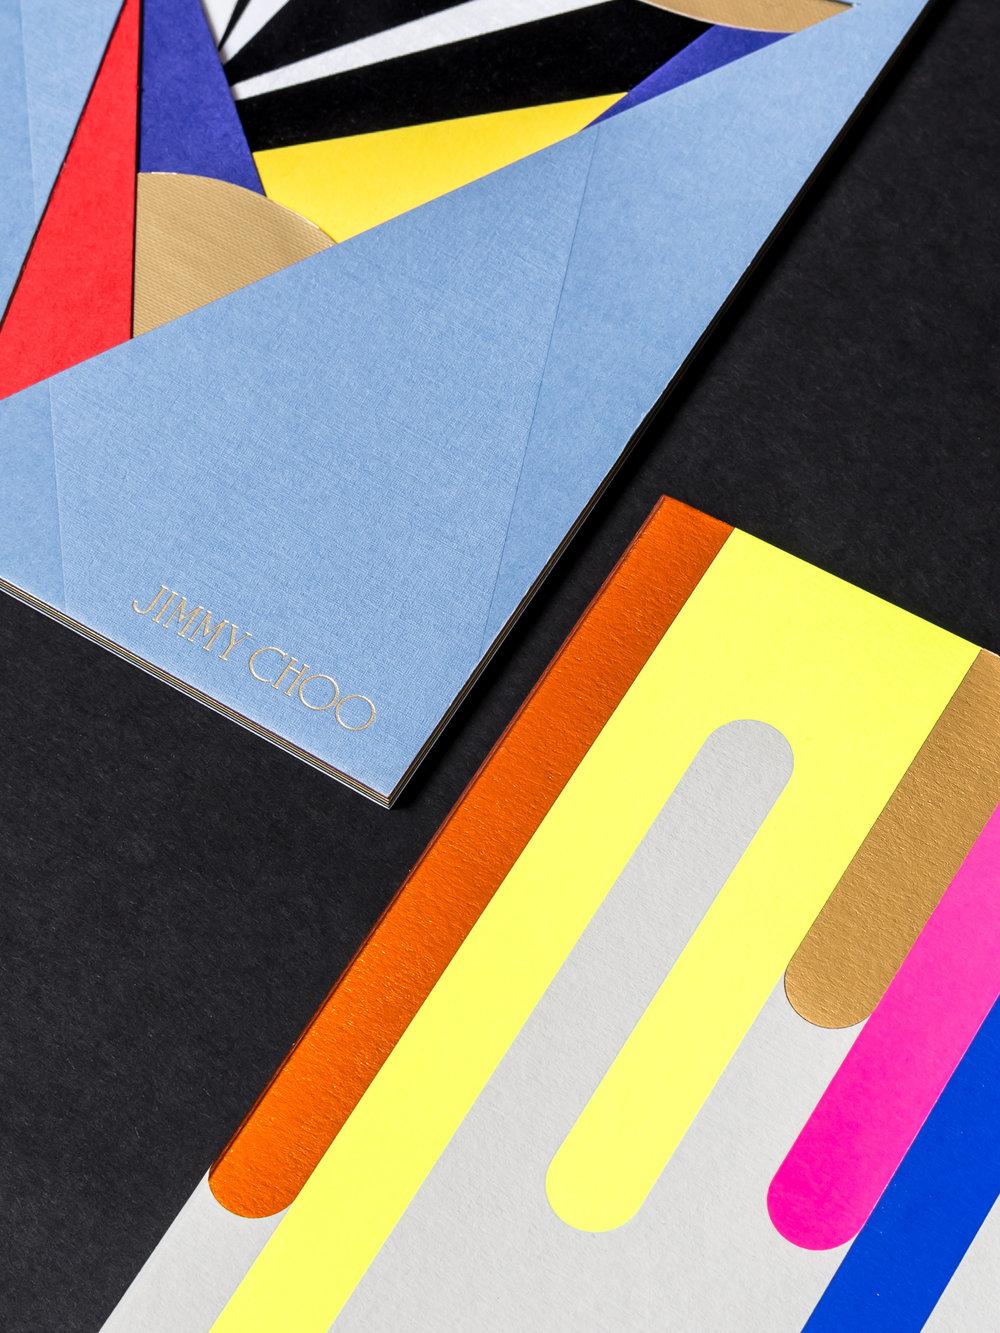 GF Smith - Colorplan - Studio - LR-32.jpg